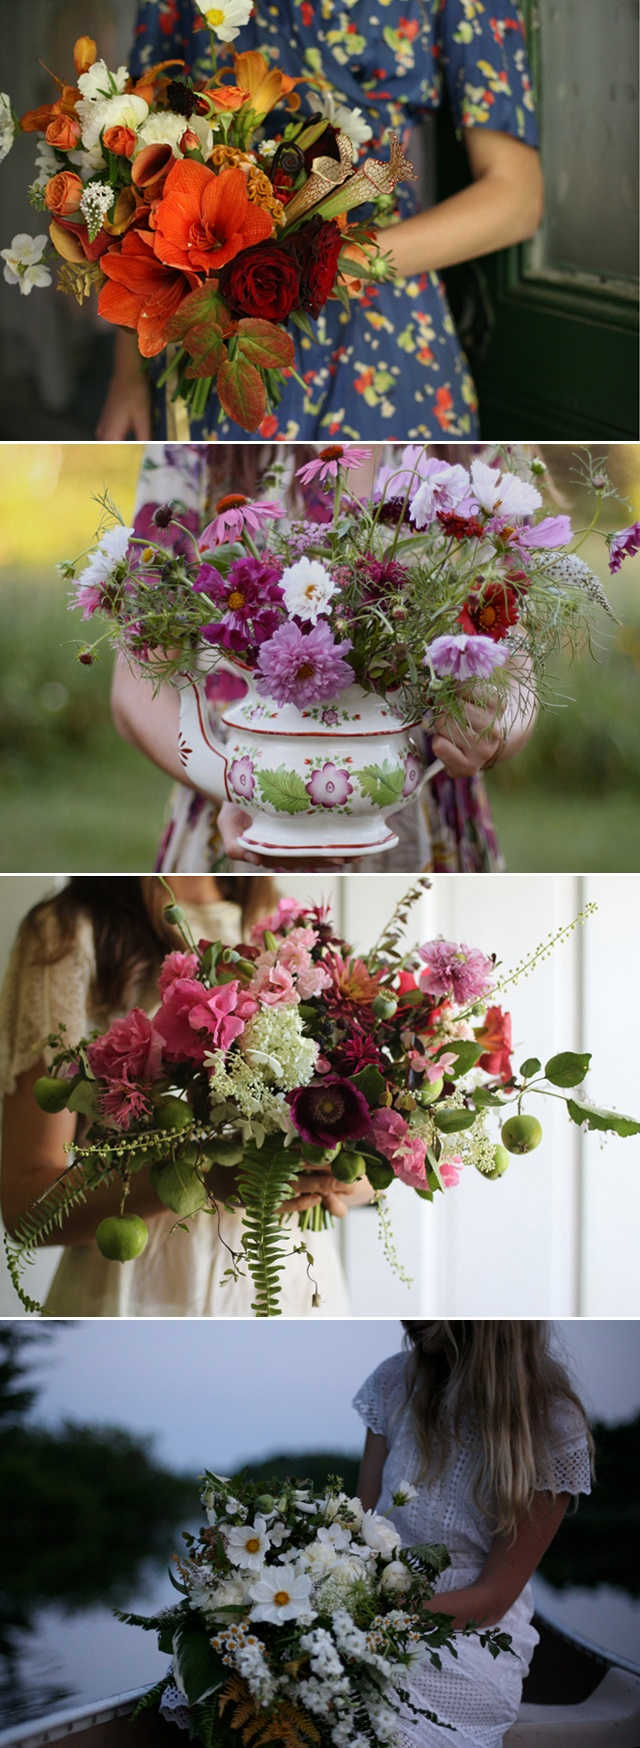 Wedding bouquets not flowers   best I uc Weddings Flowers images on Pinterest  Bridal bouquets